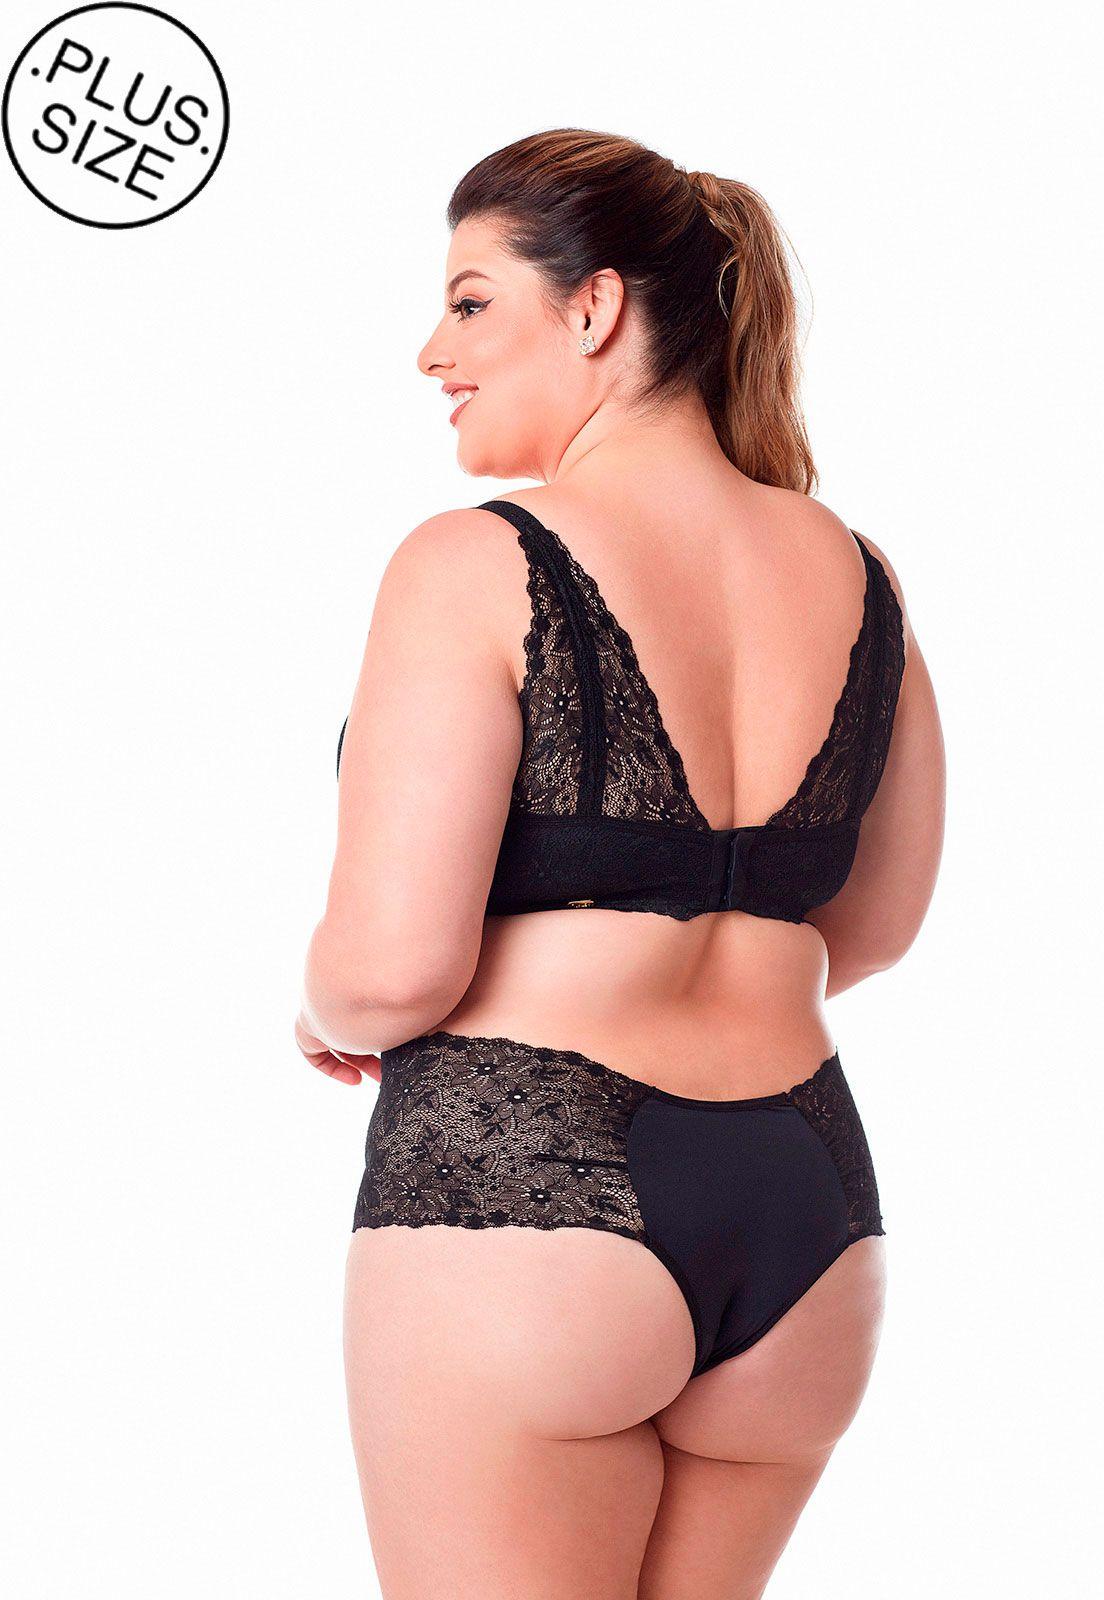 Sutia costas rendadas Dukley Lingerie Plus Size - 155